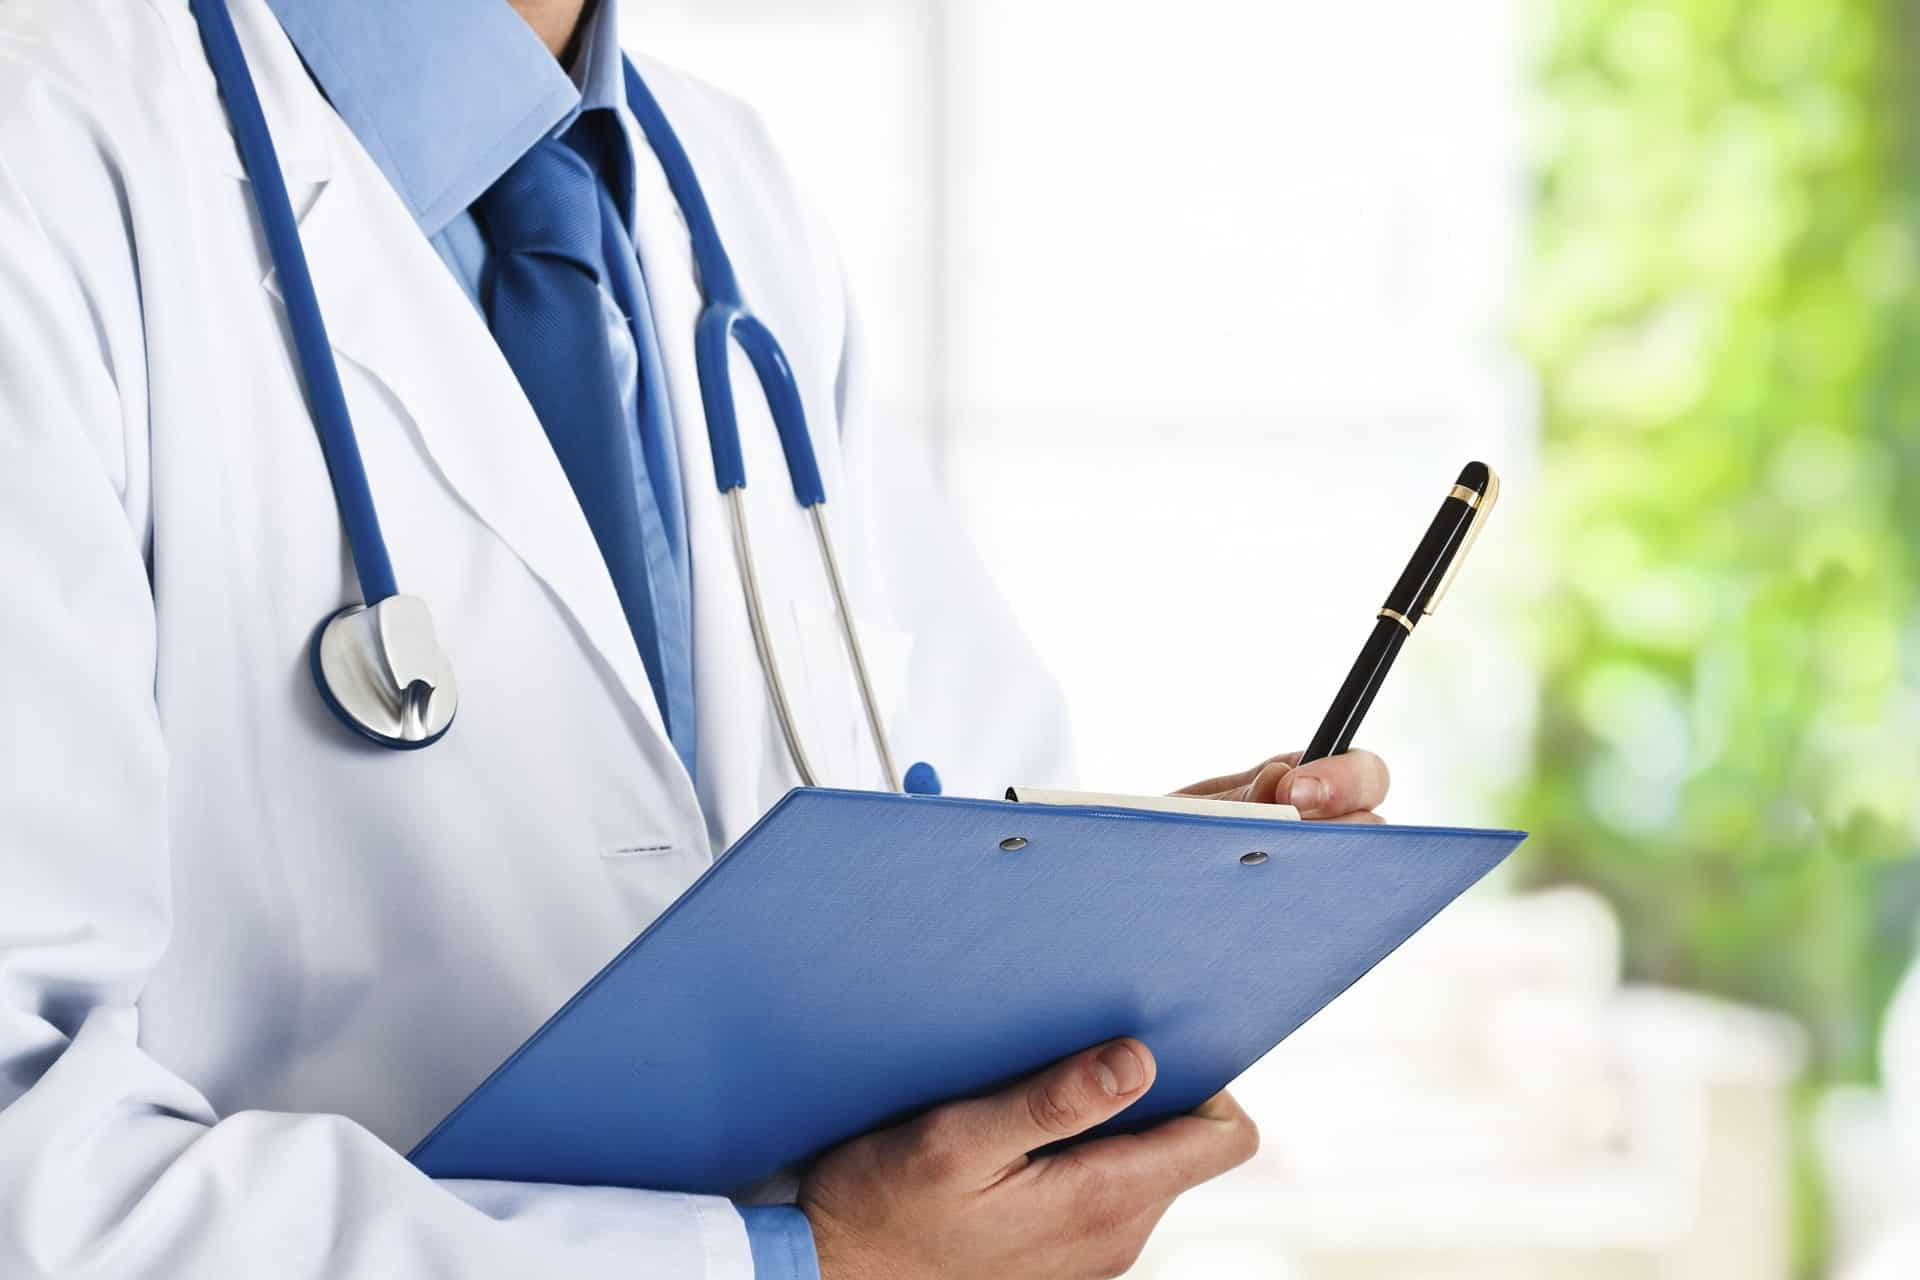 21b2ca622a9b6 تجارب علاج البواسير للحامل - موسوعة